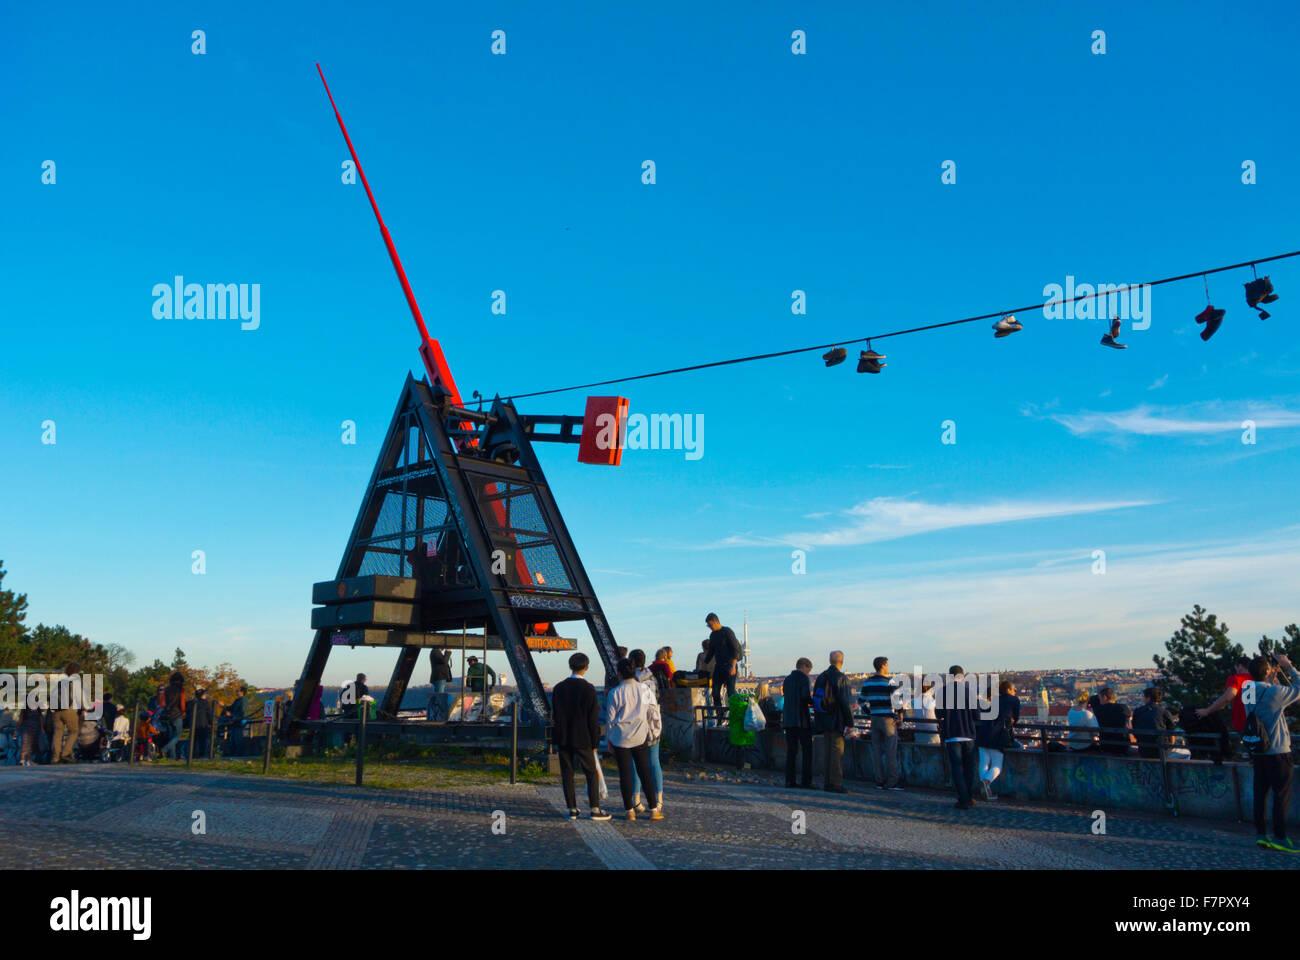 Metronome, Letna Park, Prague, Czech Republic - Stock Image